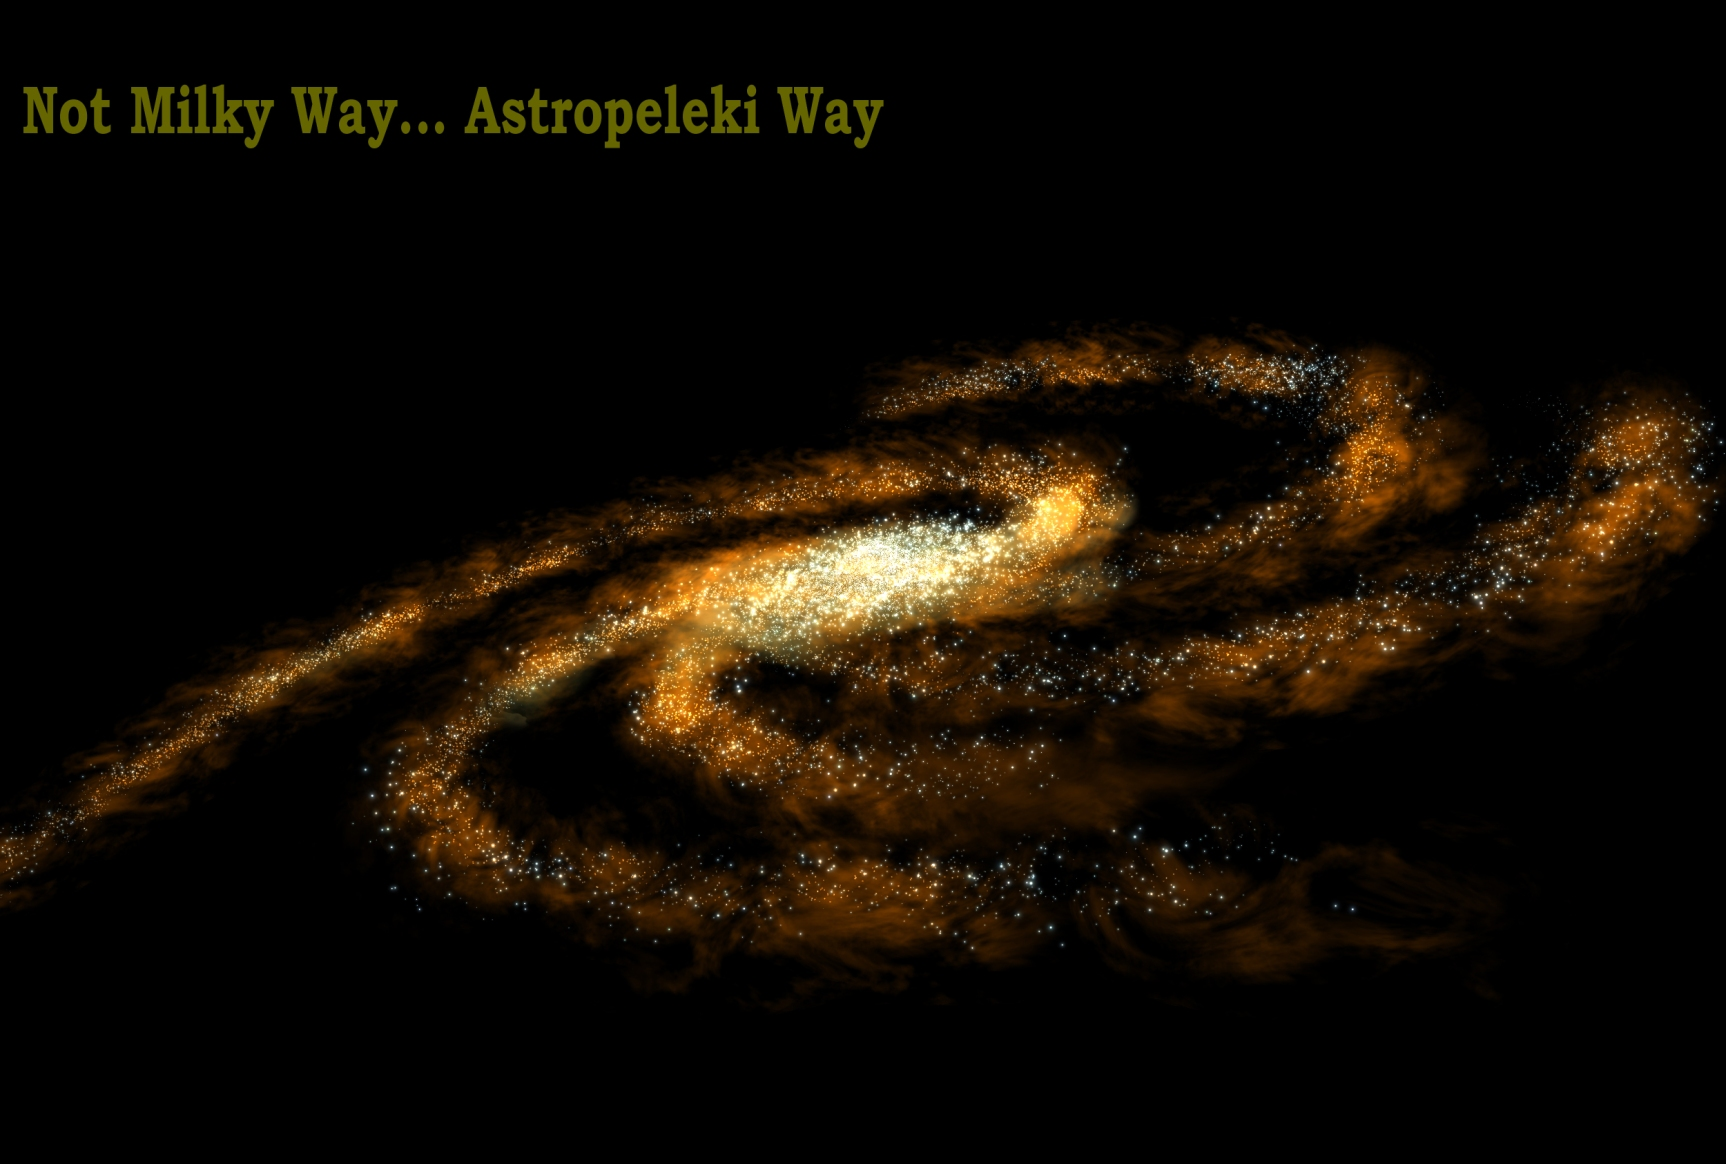 astropeleki-way.jpg